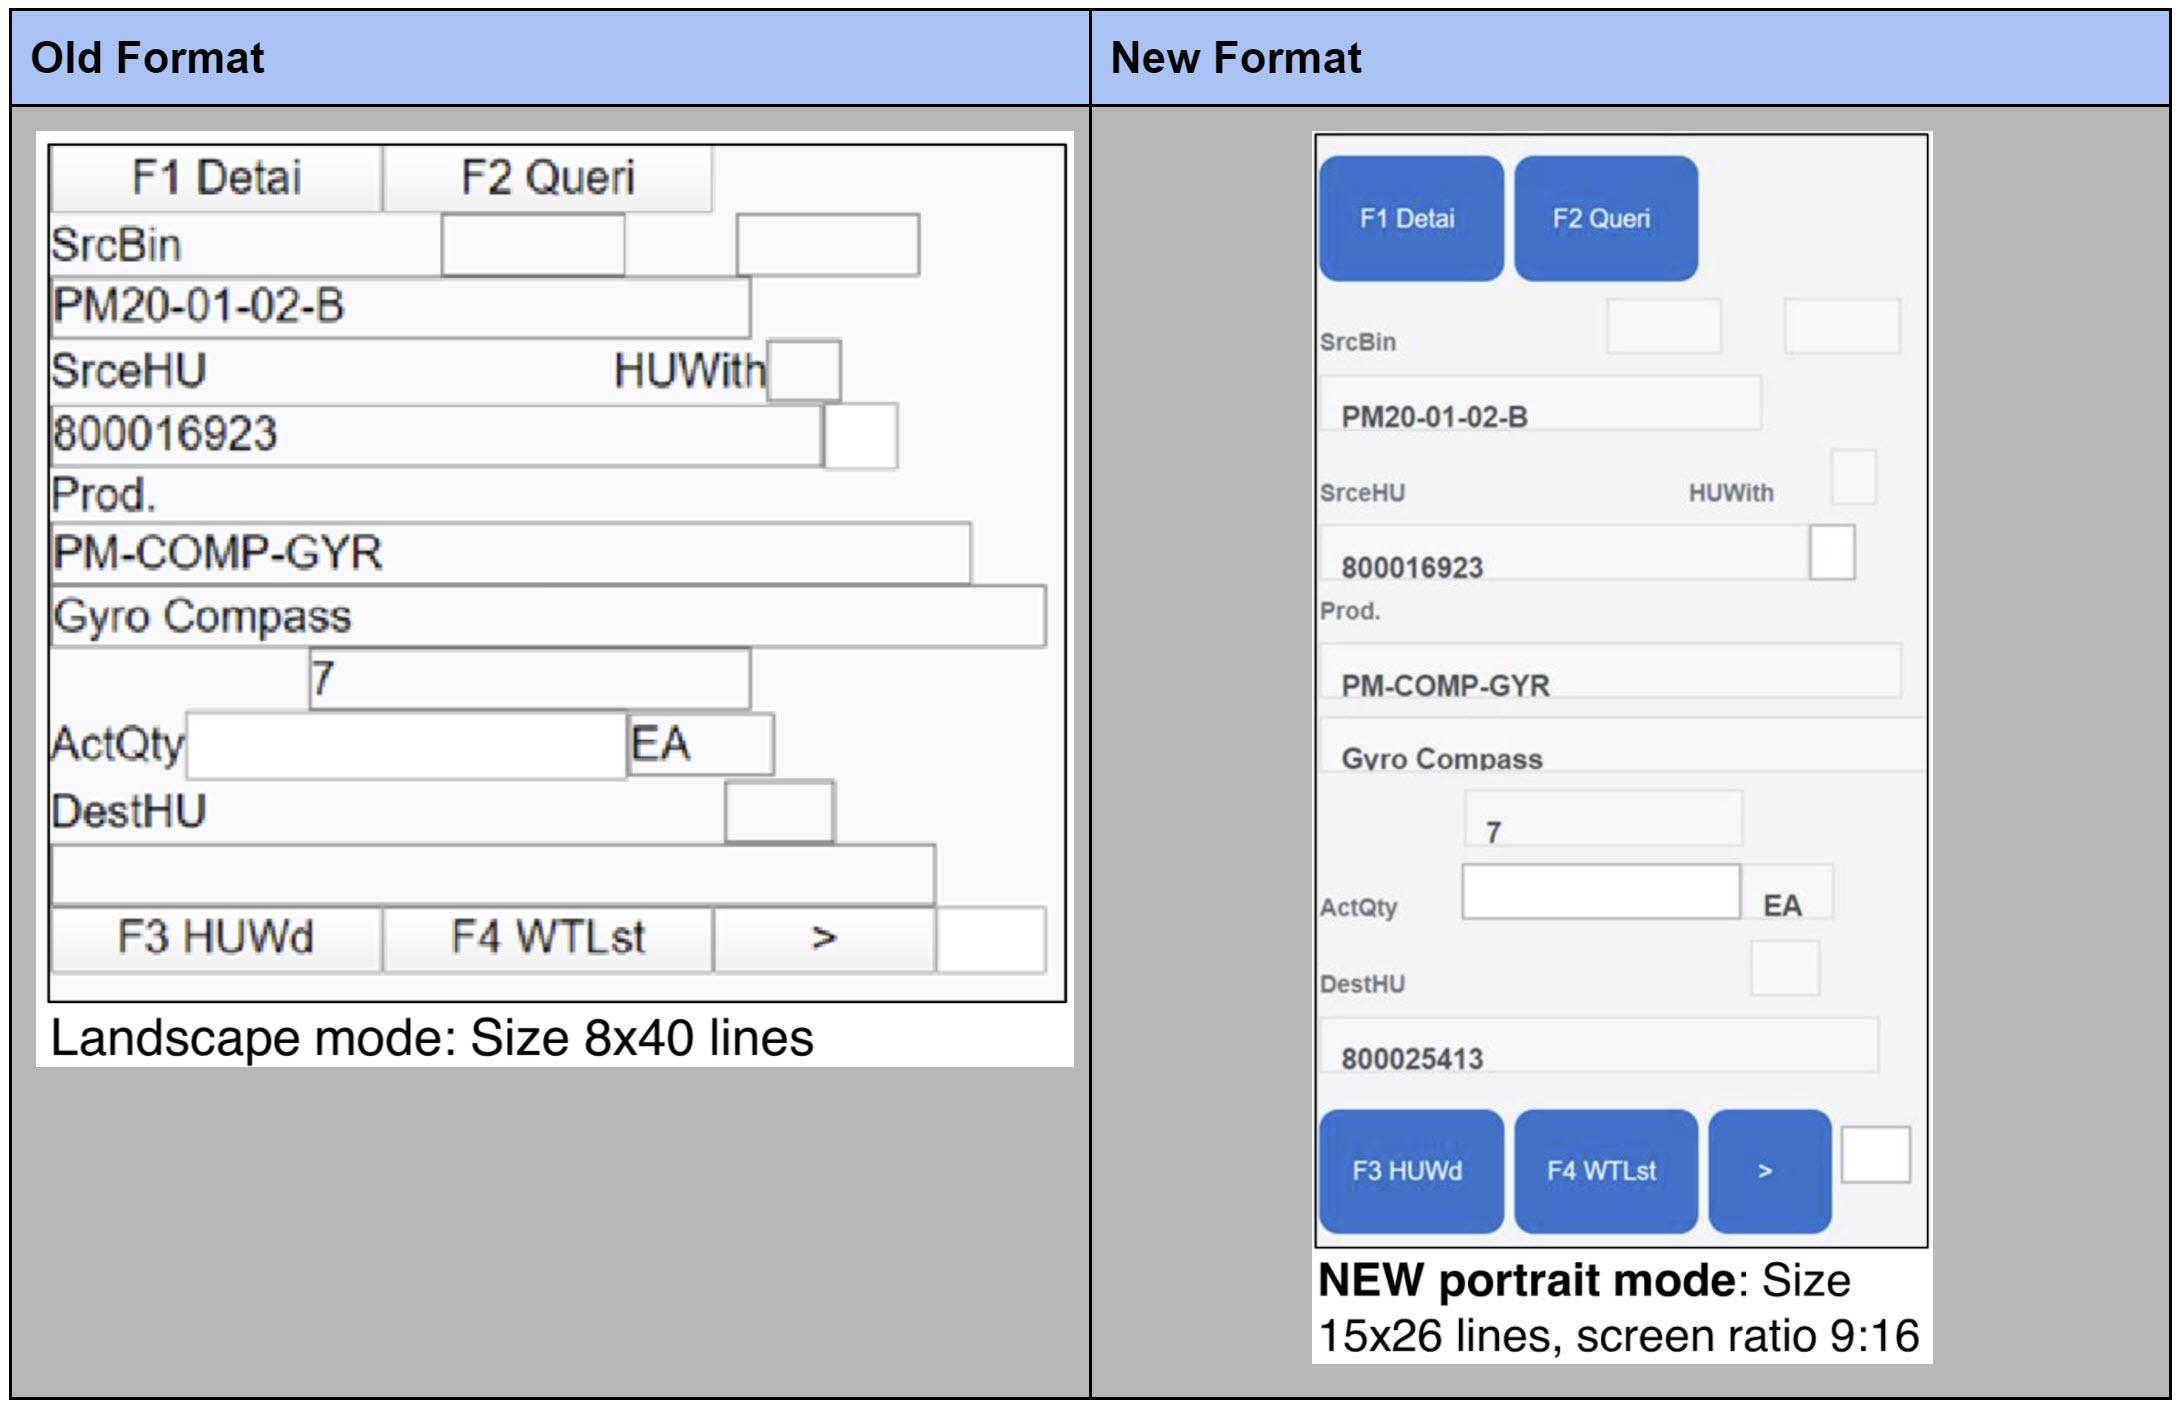 RF Portrait Mode for EWM on S/4HANA 2020